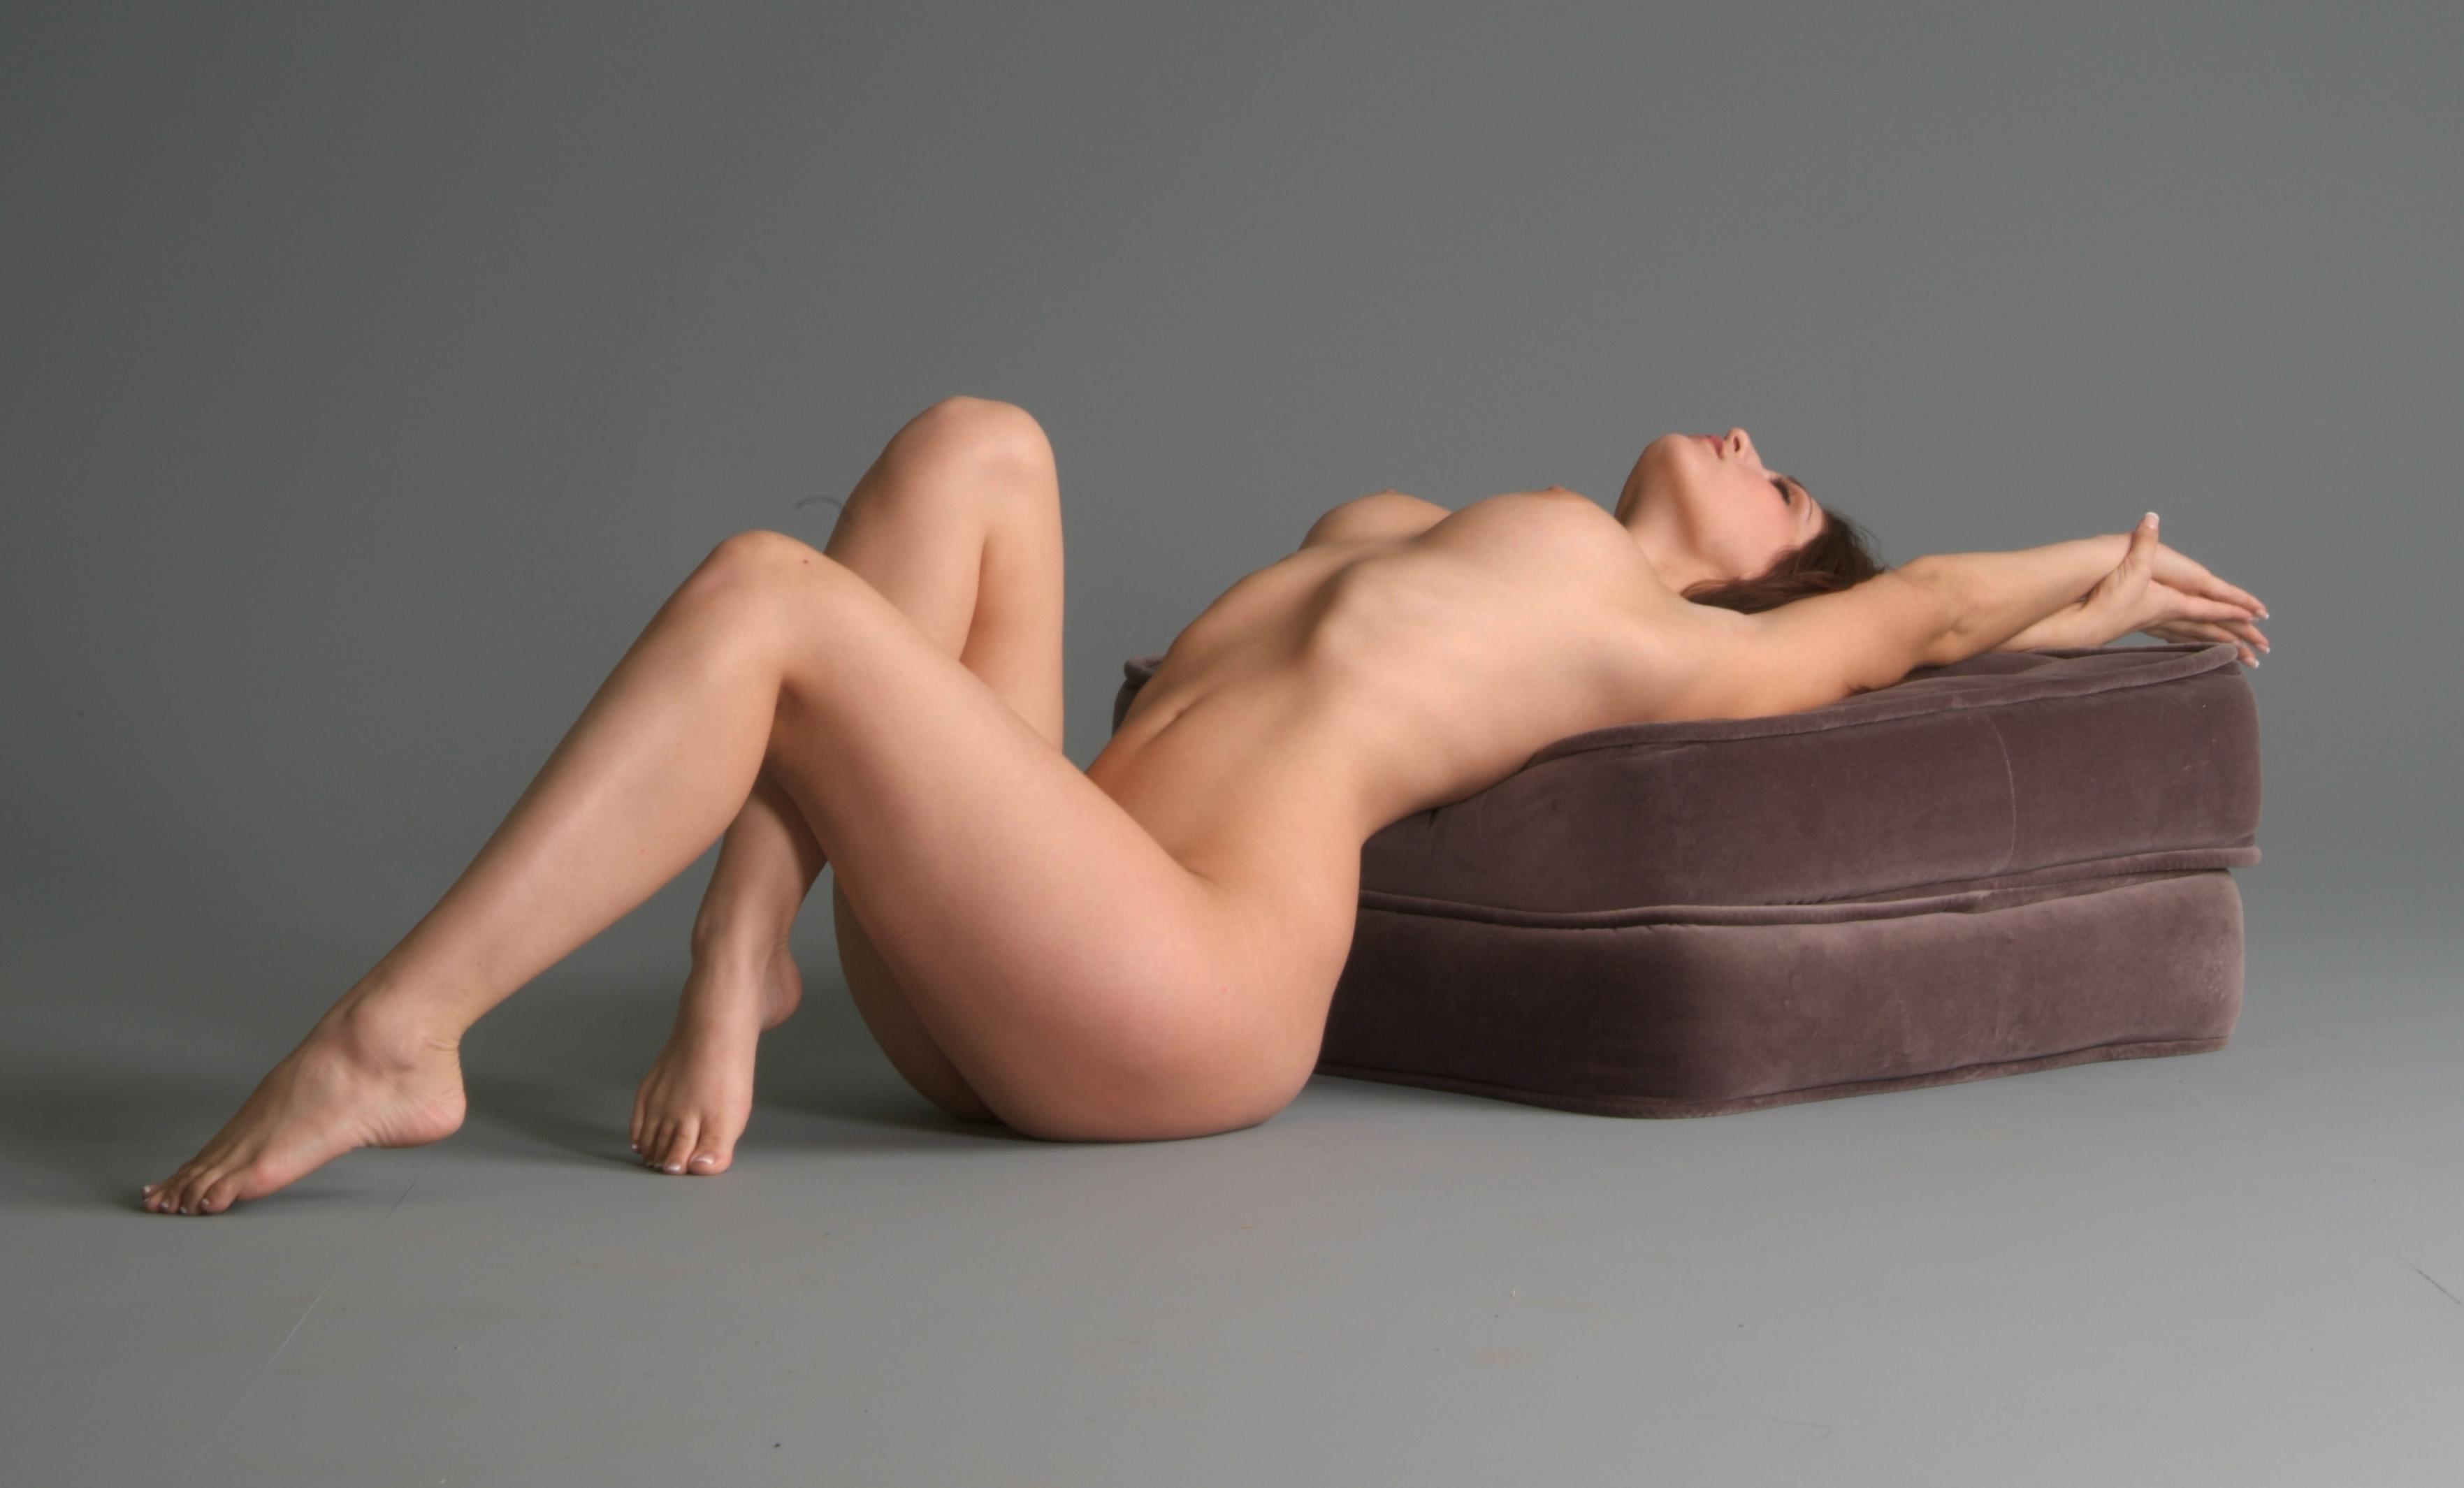 Mature nude model artistic tits ever!